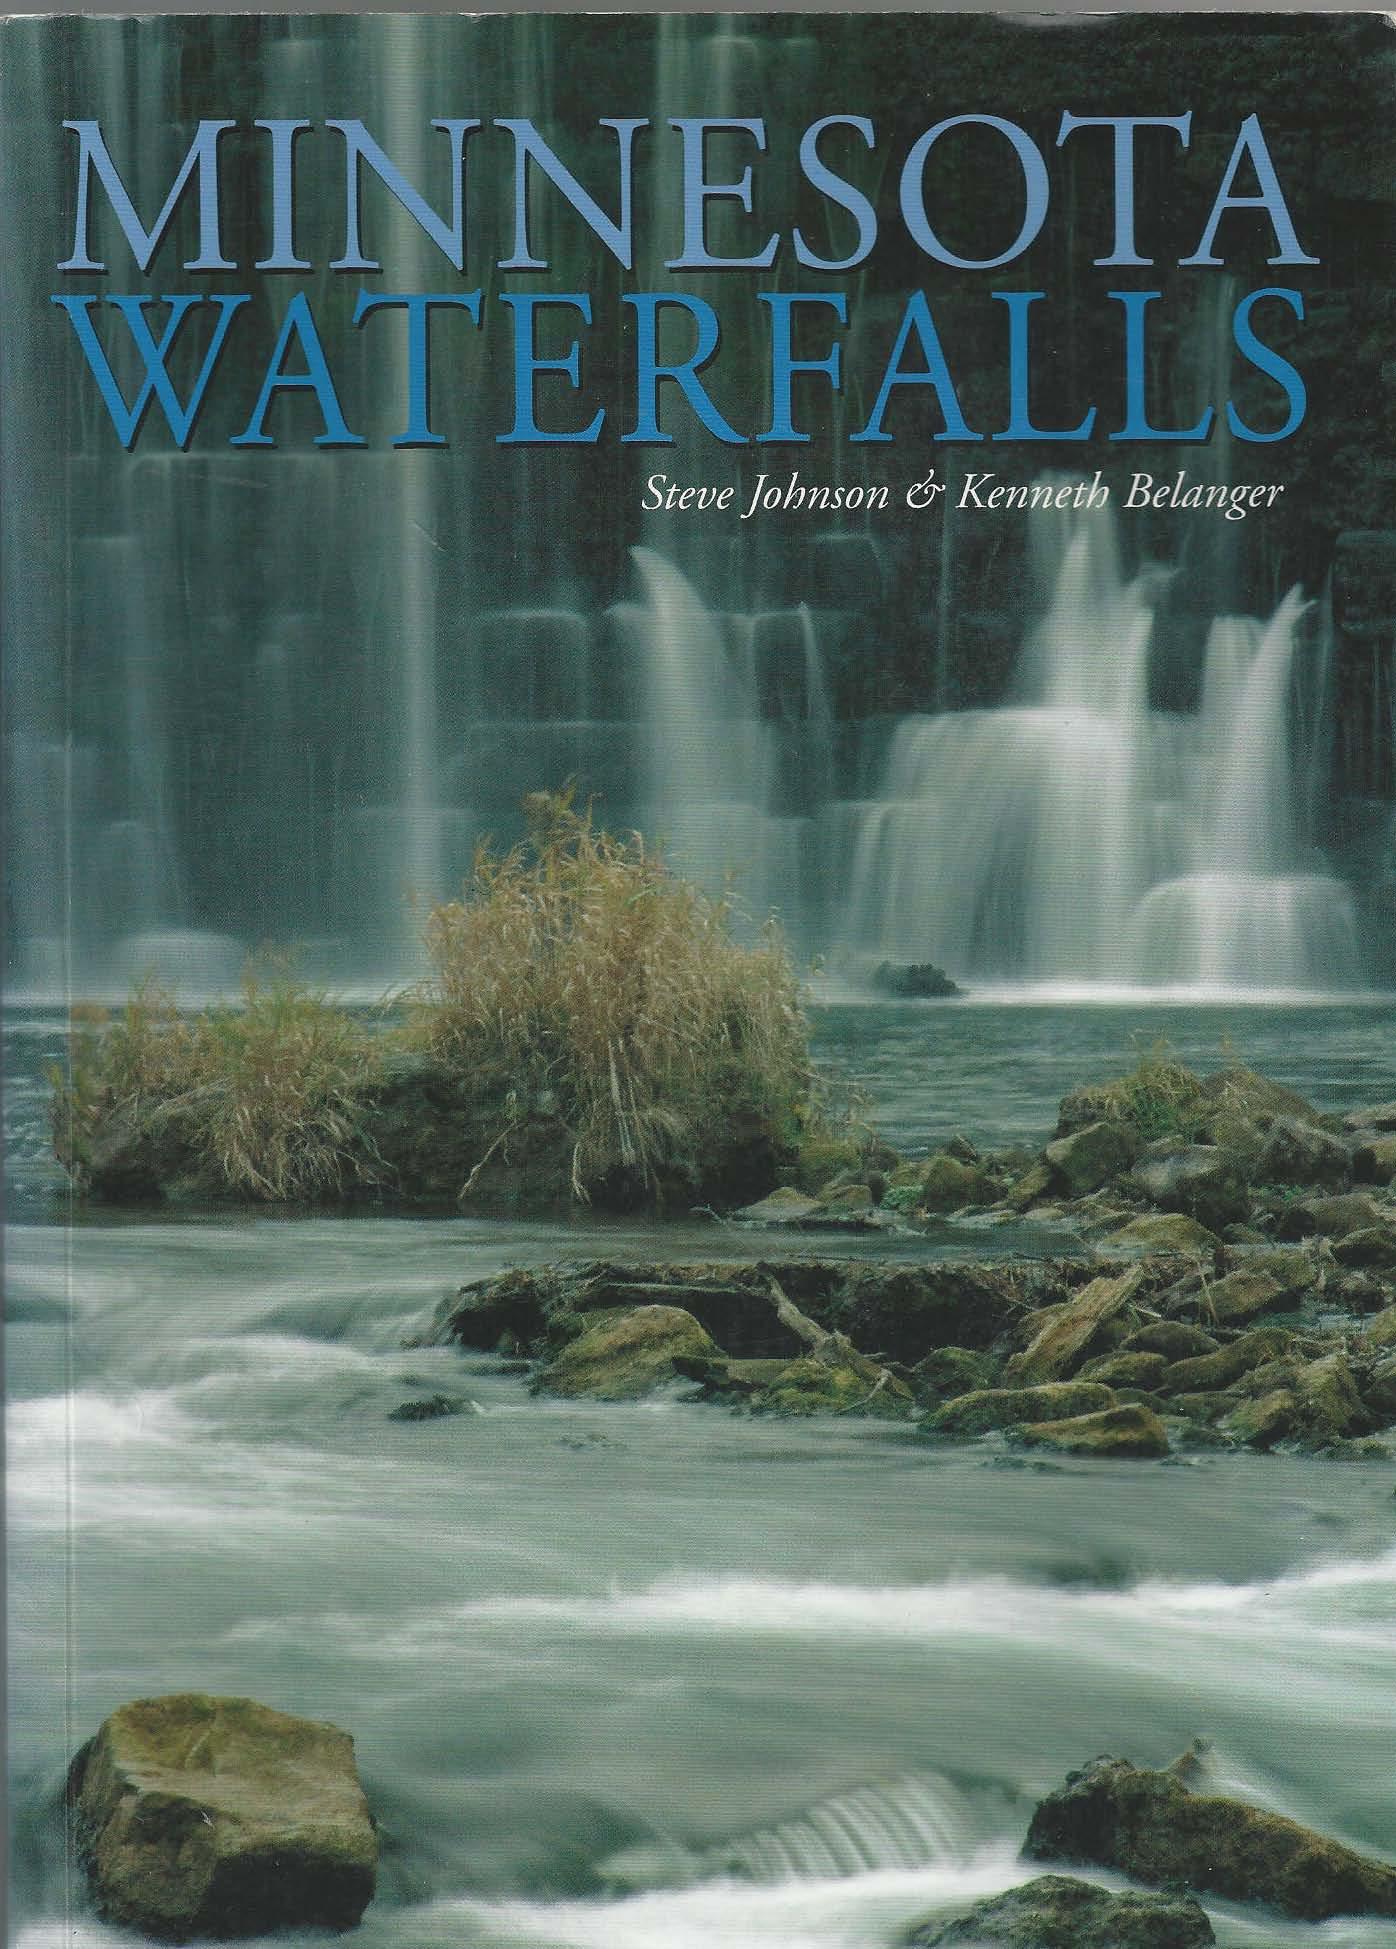 mnwaterfalls.jpg